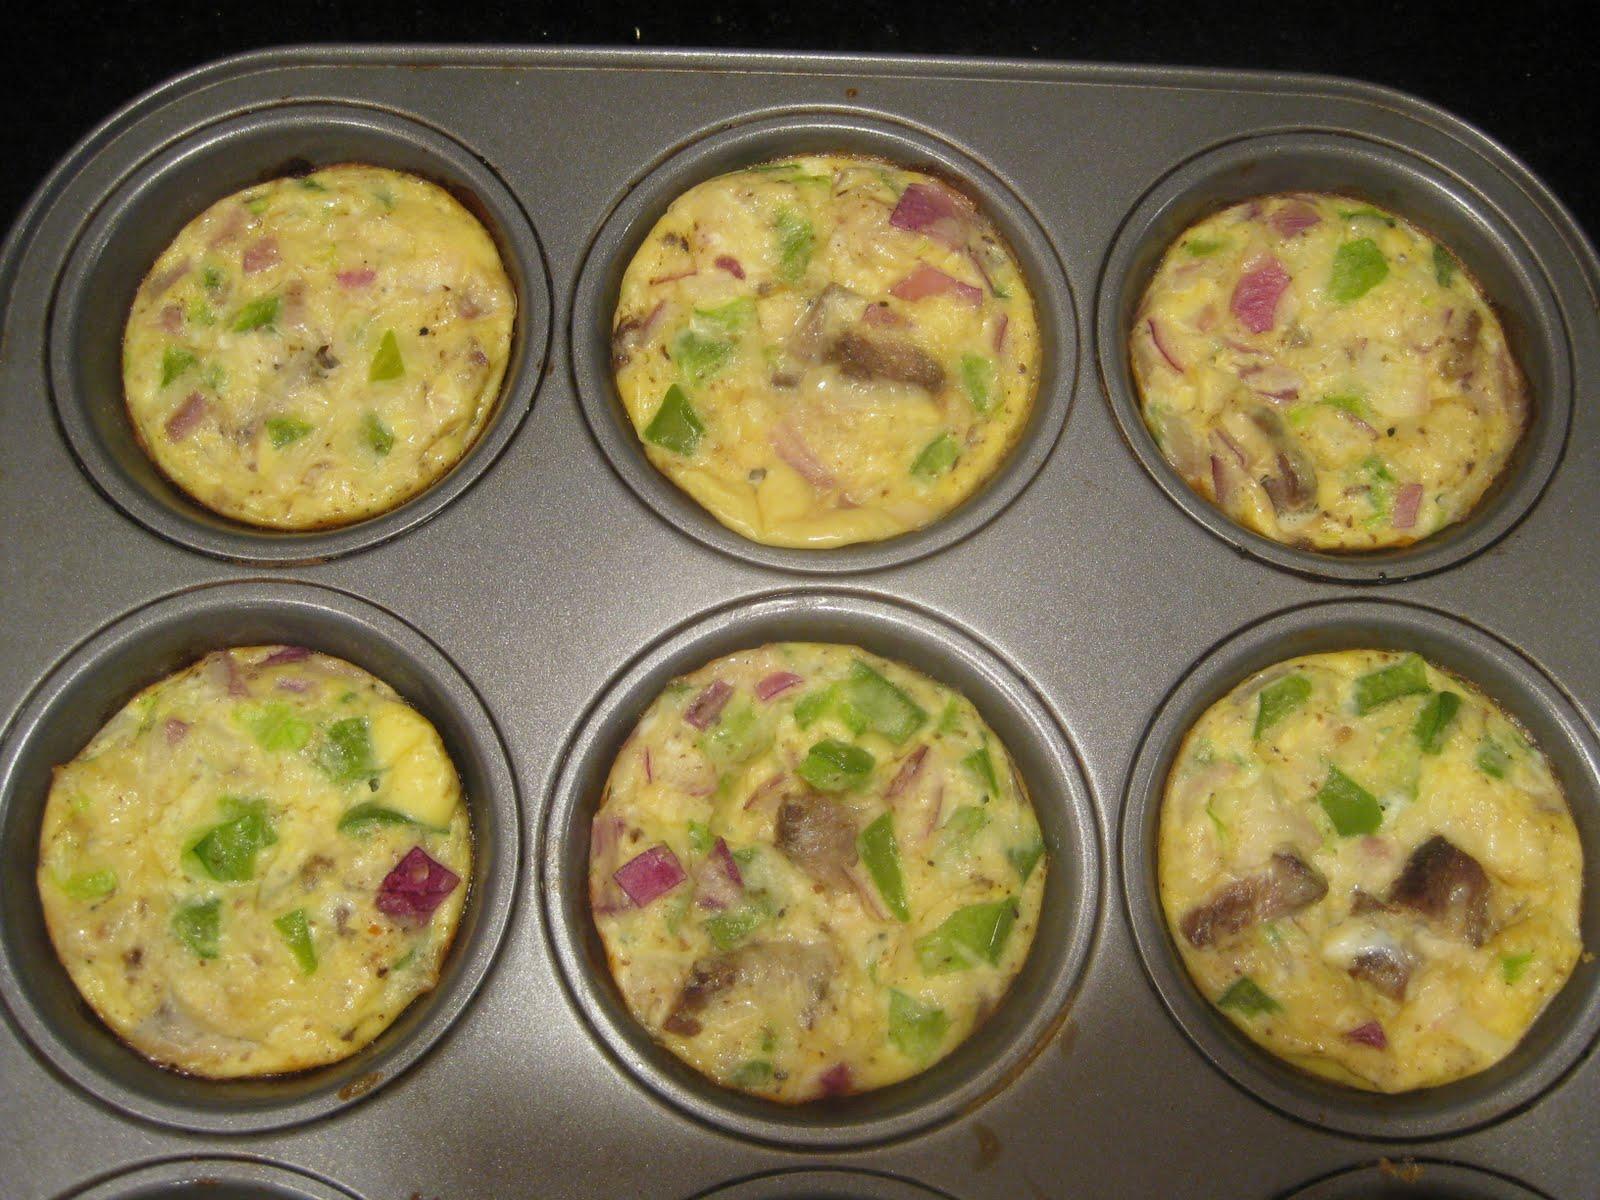 Broccoli And Cheese Mini Egg Omelets Recipes — Dishmaps